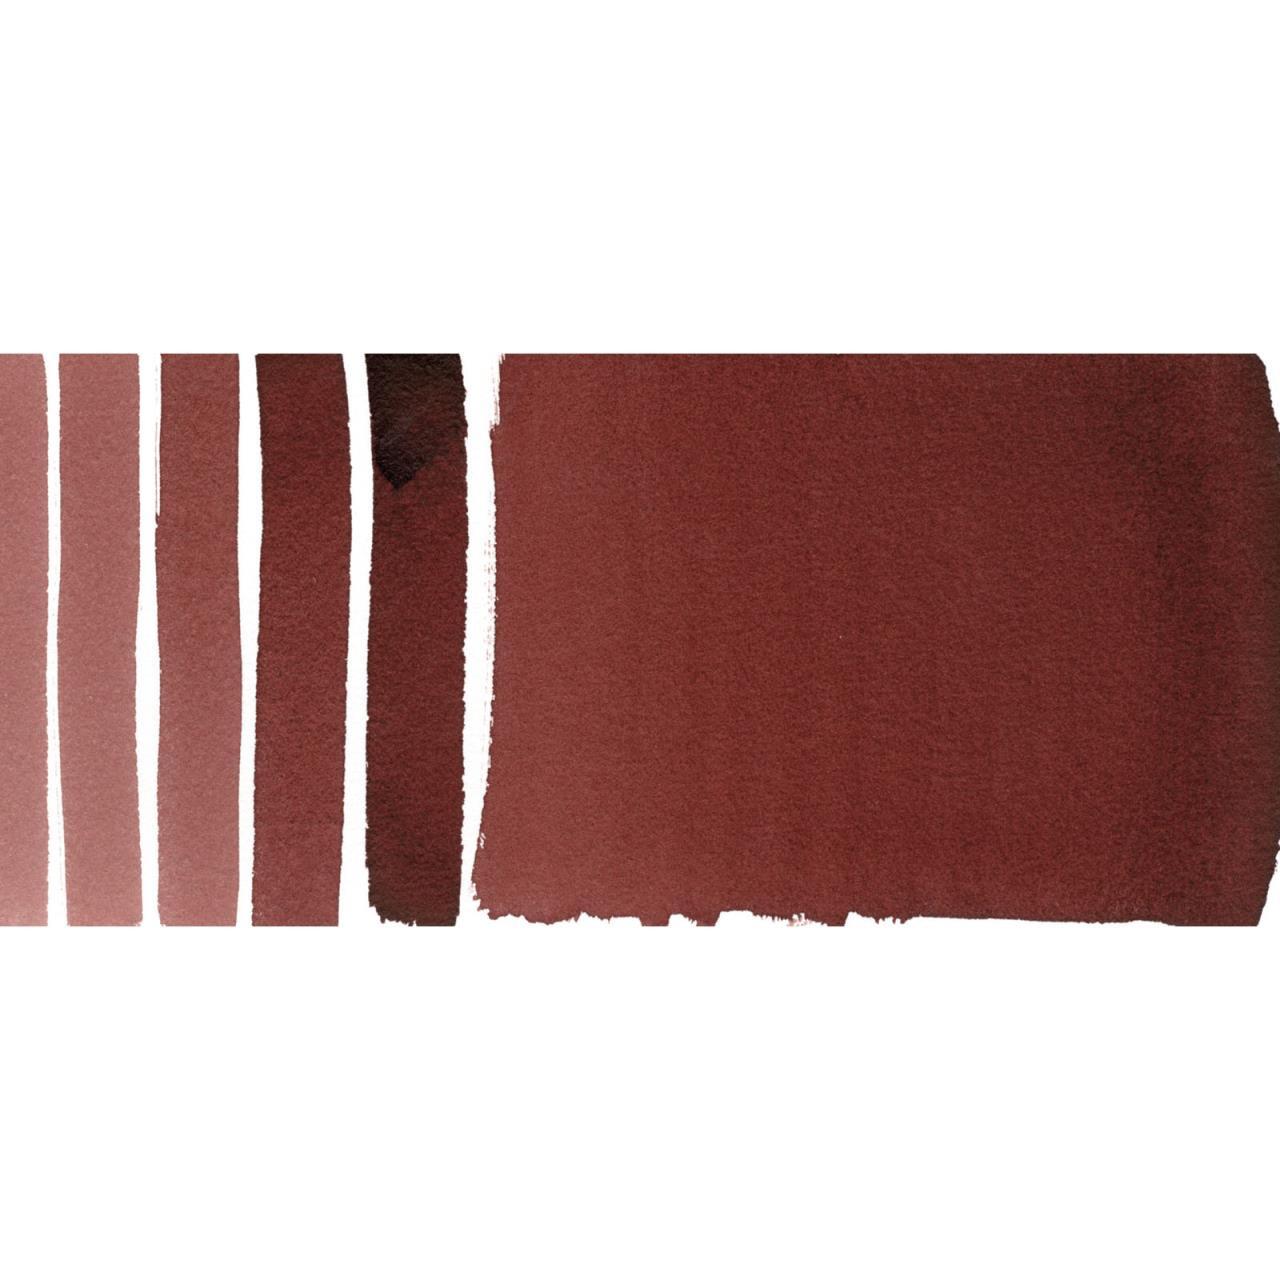 Perylene Maroon, DANIEL SMITH Extra Fine Watercolors 15ml Tubes -